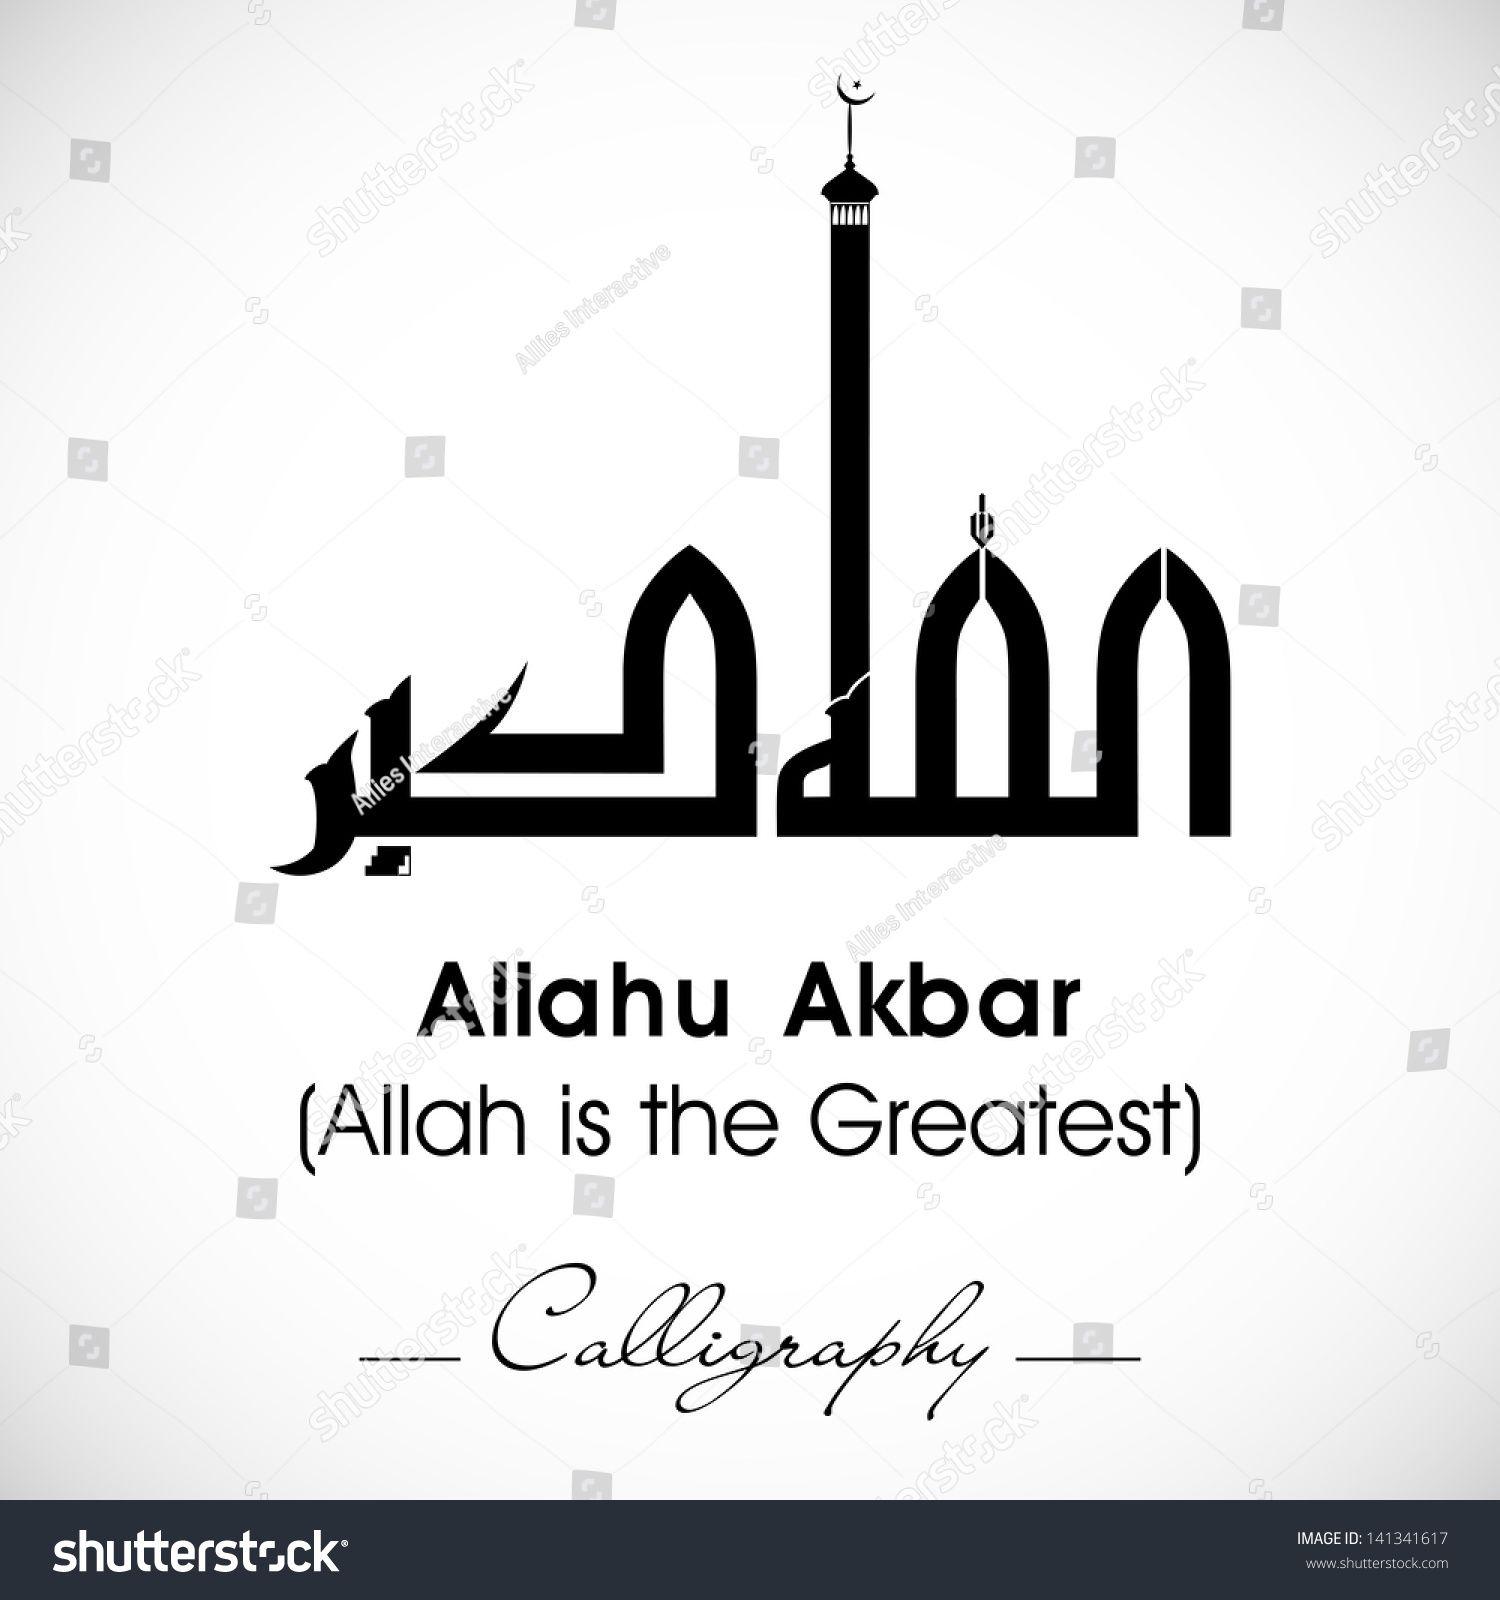 Arabic Islamic Calligraphy Of Dua Wish Allahu Akbar Allah Is The Greatest On Abstra Islamic Calligraphy Islamic Art Calligraphy Islamic Calligraphy Painting